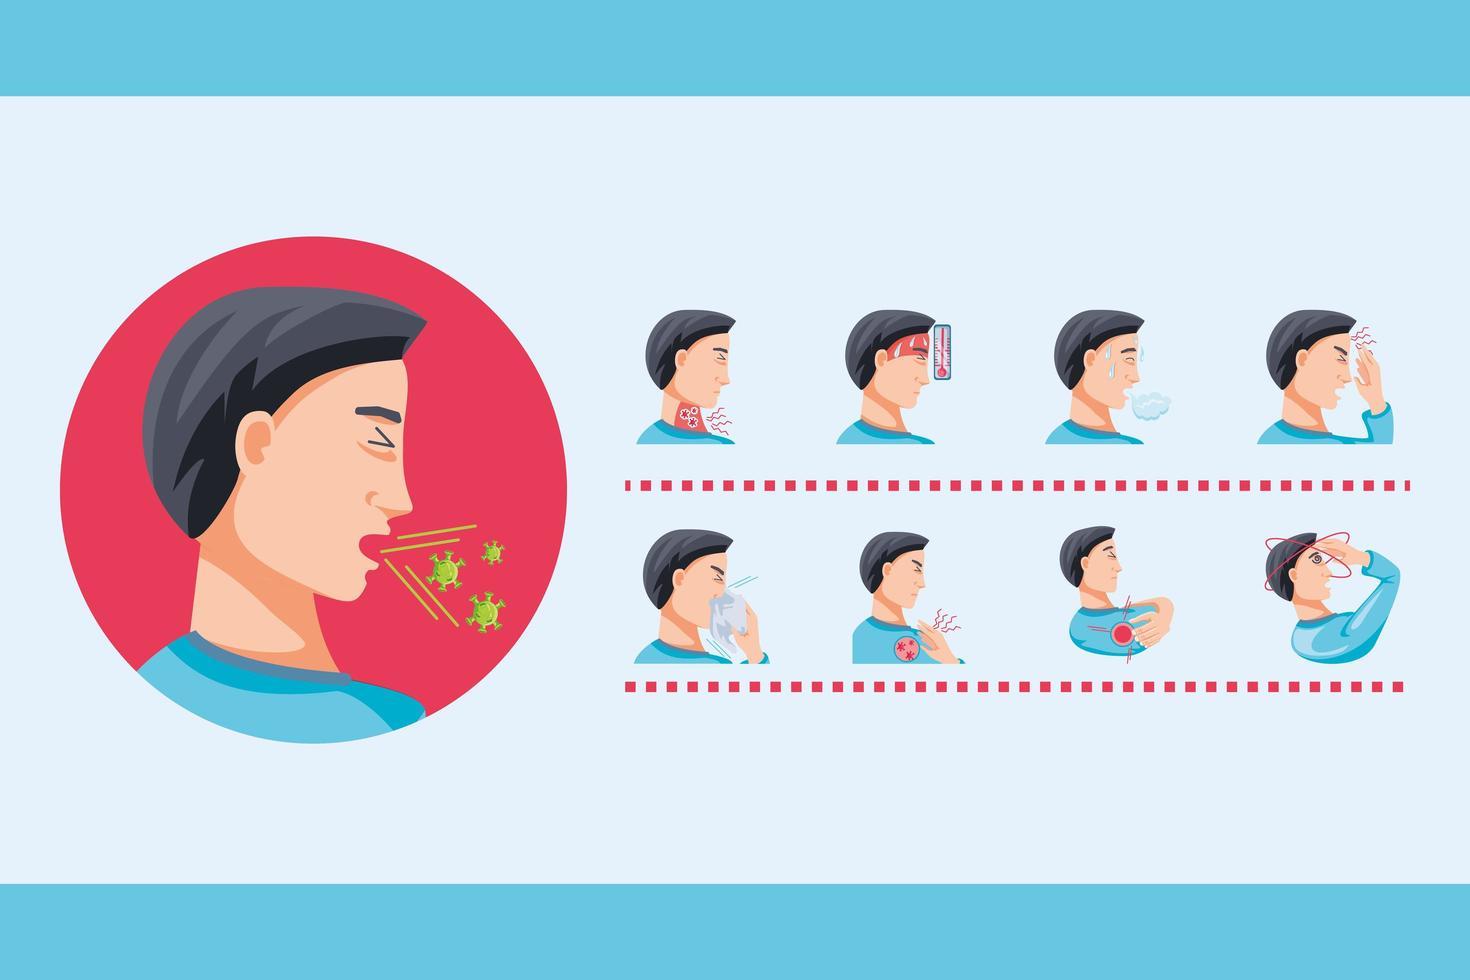 Satz von Symbolen mit Symptomen des Coronavirus vektor